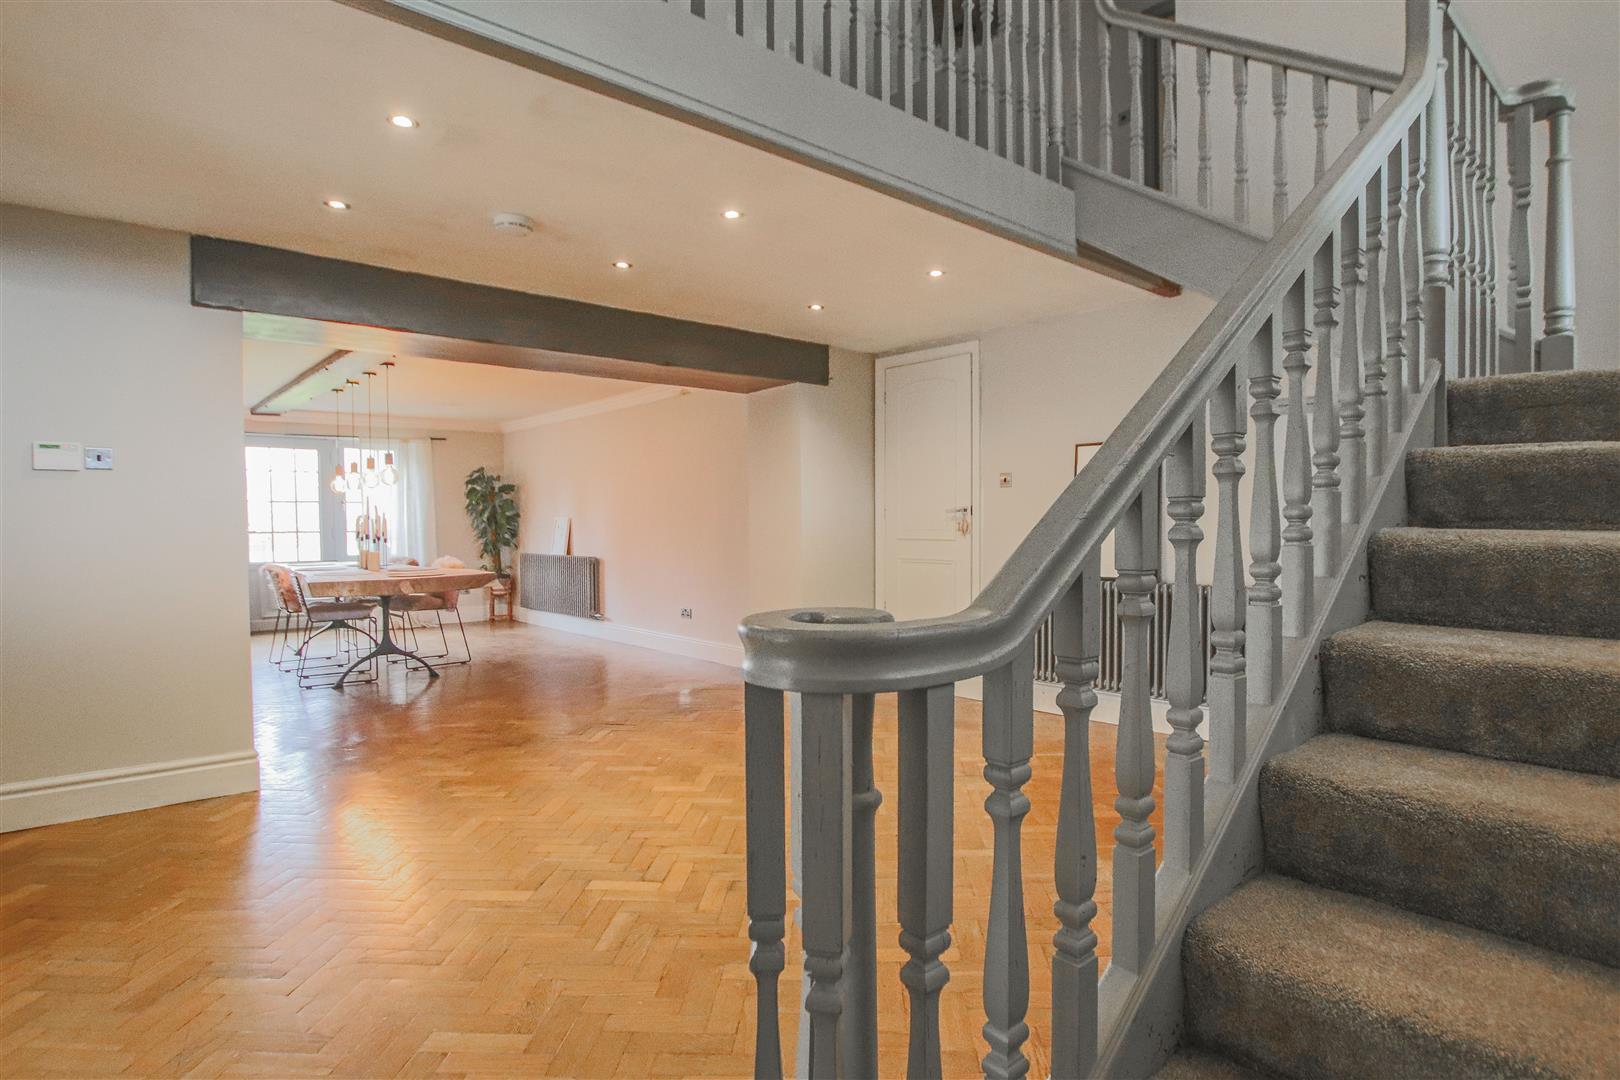 6 Bedroom Barn Conversion For Sale - 4.JPG